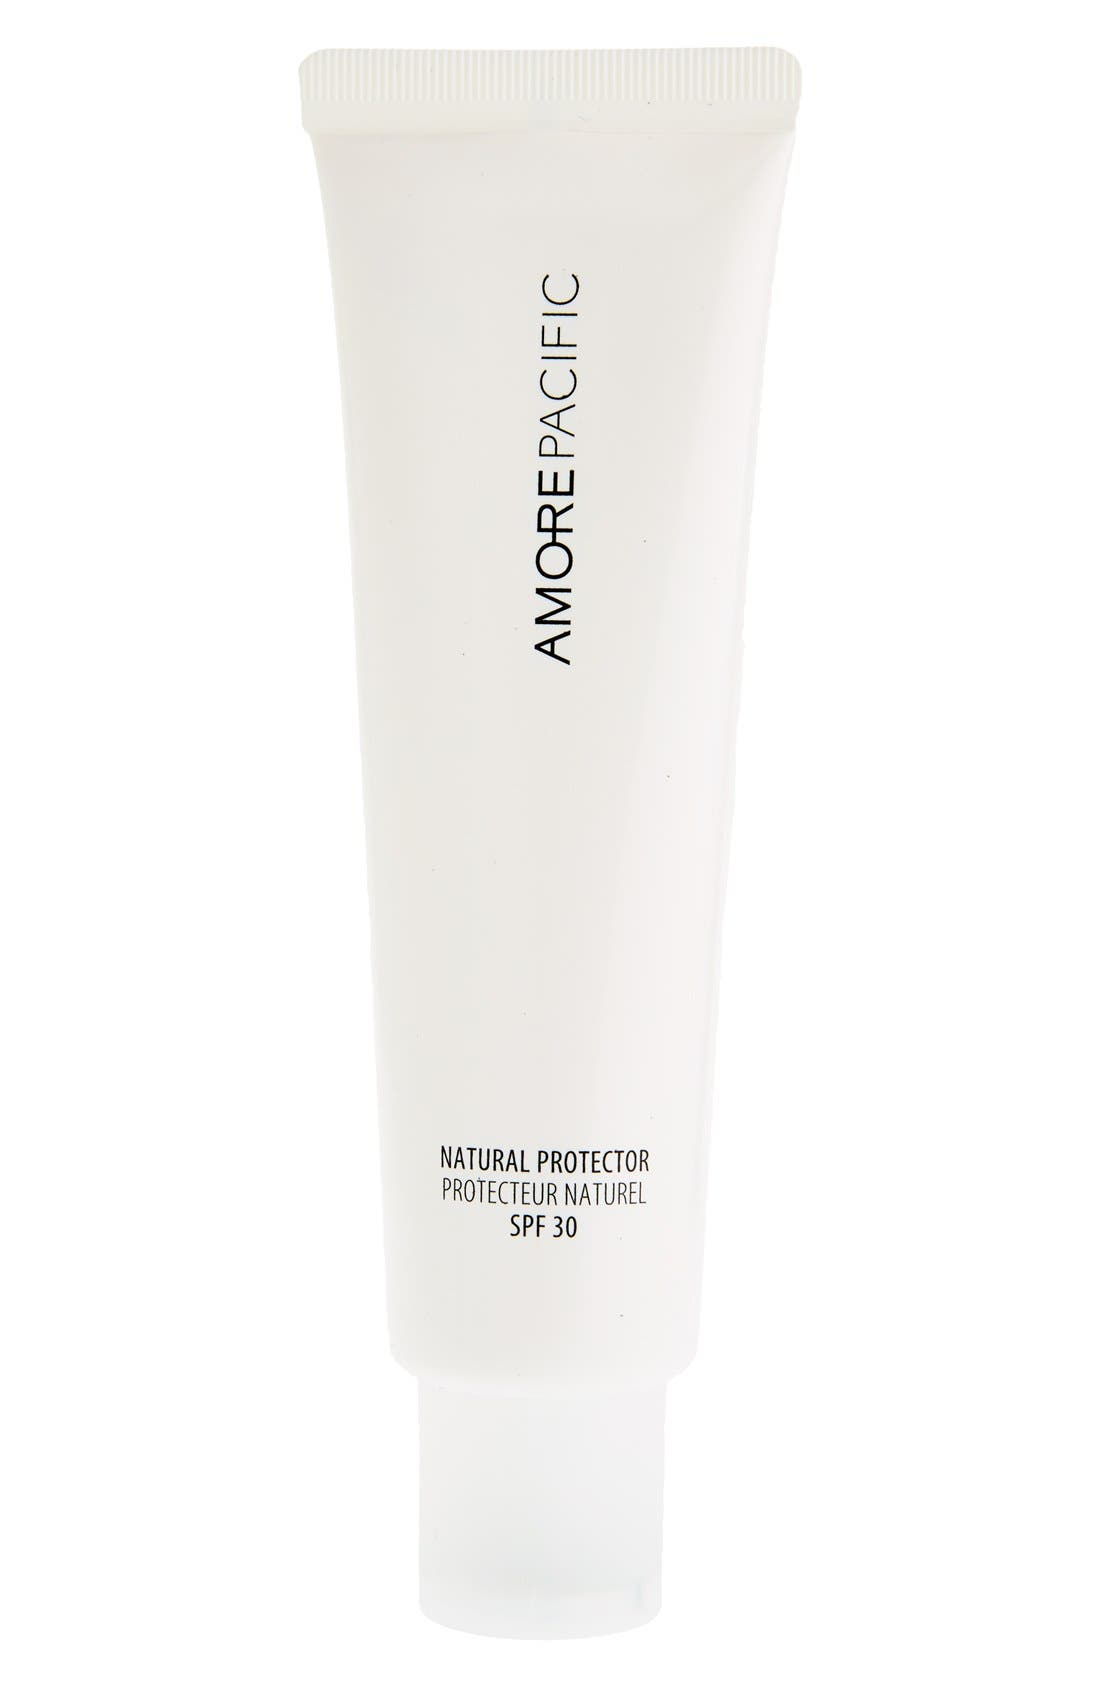 'Natural Protector' Hydrating Sunscreen SPF 30 PA+++,                             Alternate thumbnail 3, color,                             NO COLOR